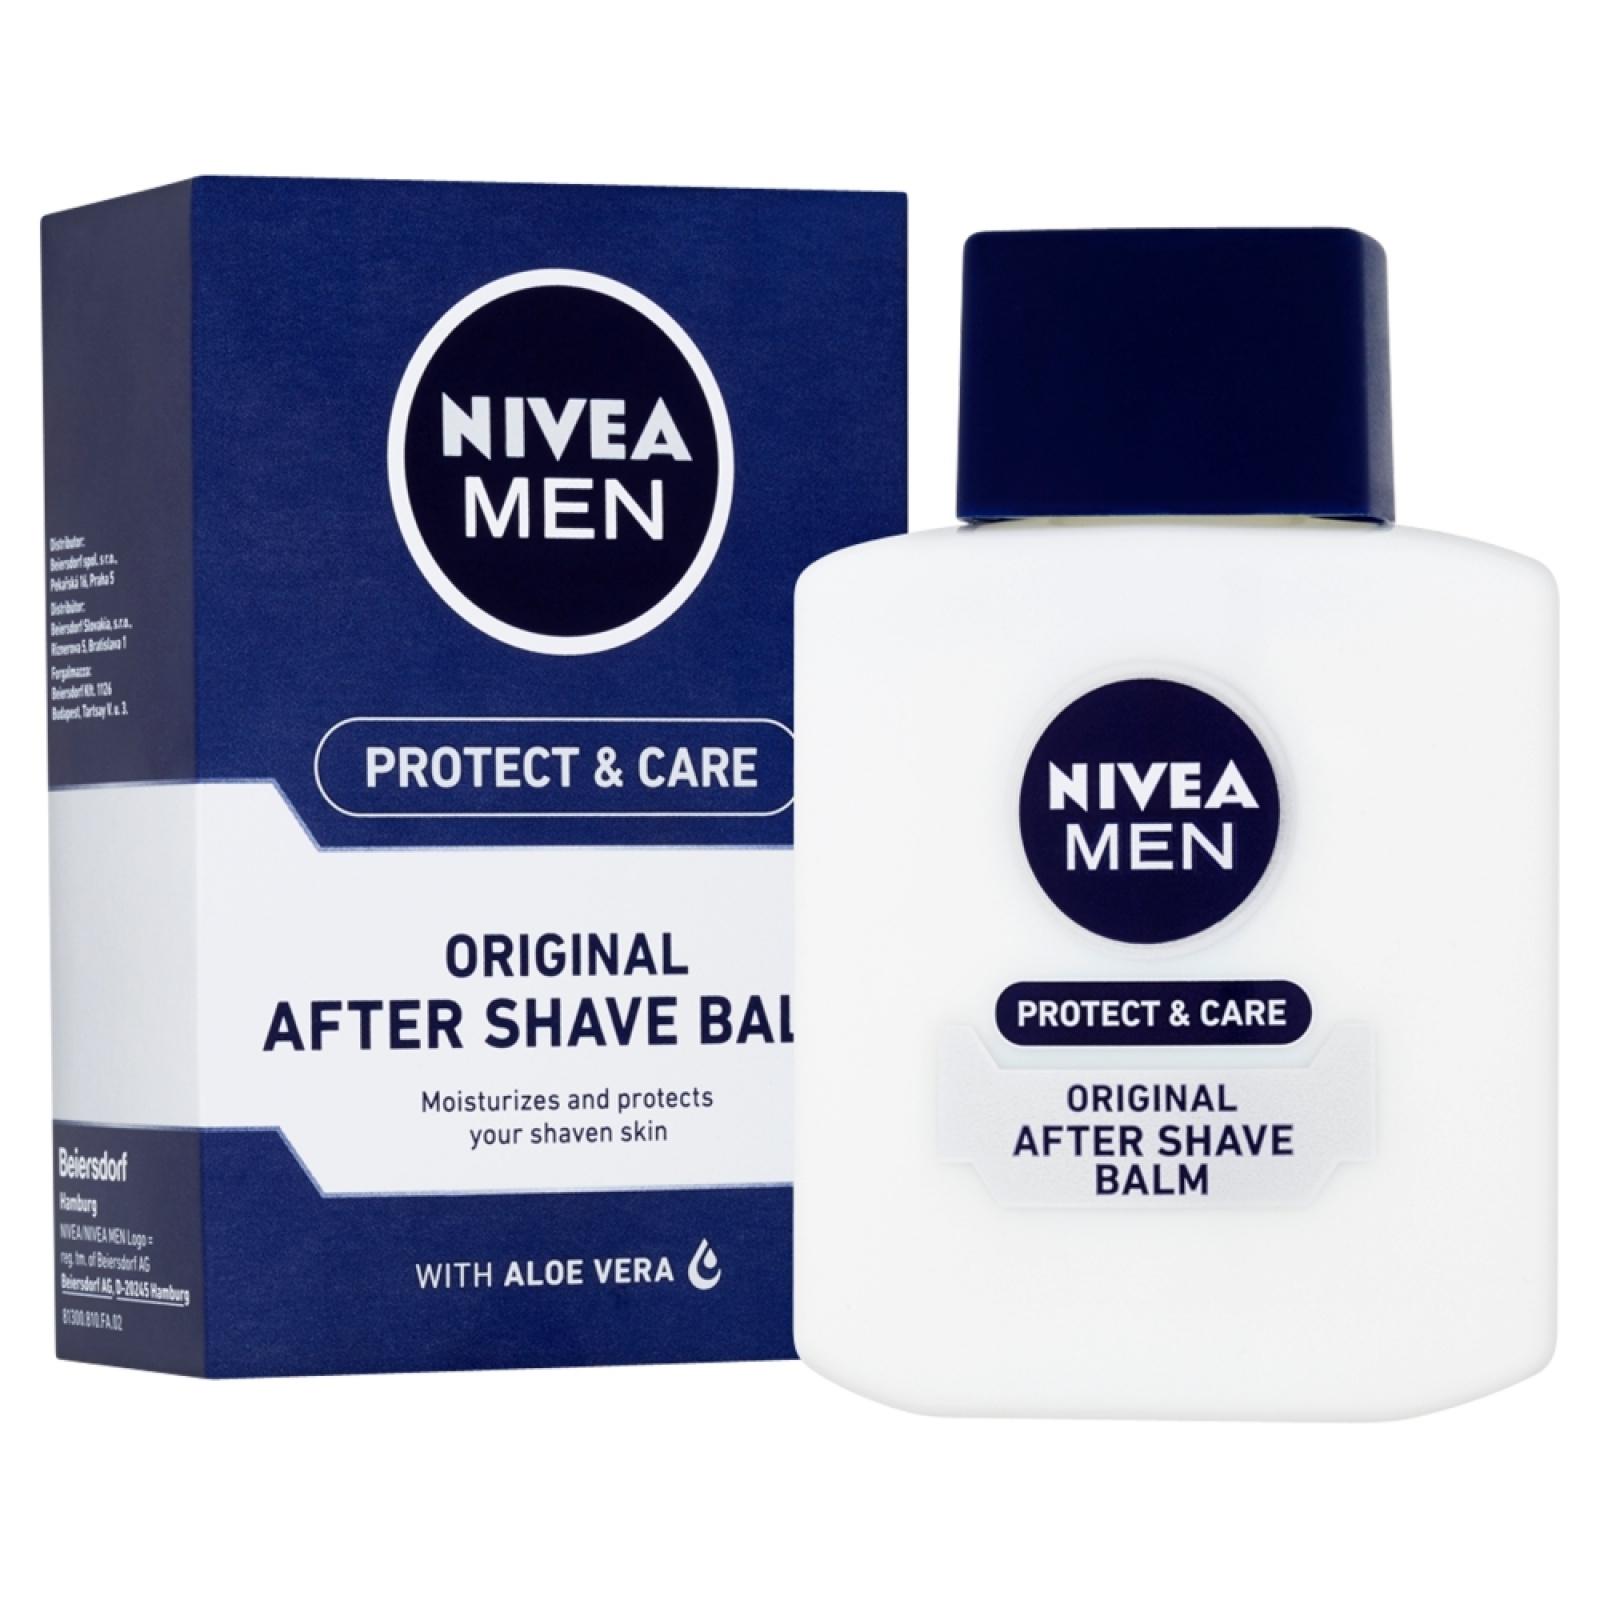 0c41f3ca95 NIVEA balzám po holení Original Protect Care 100 ml 99 Kč